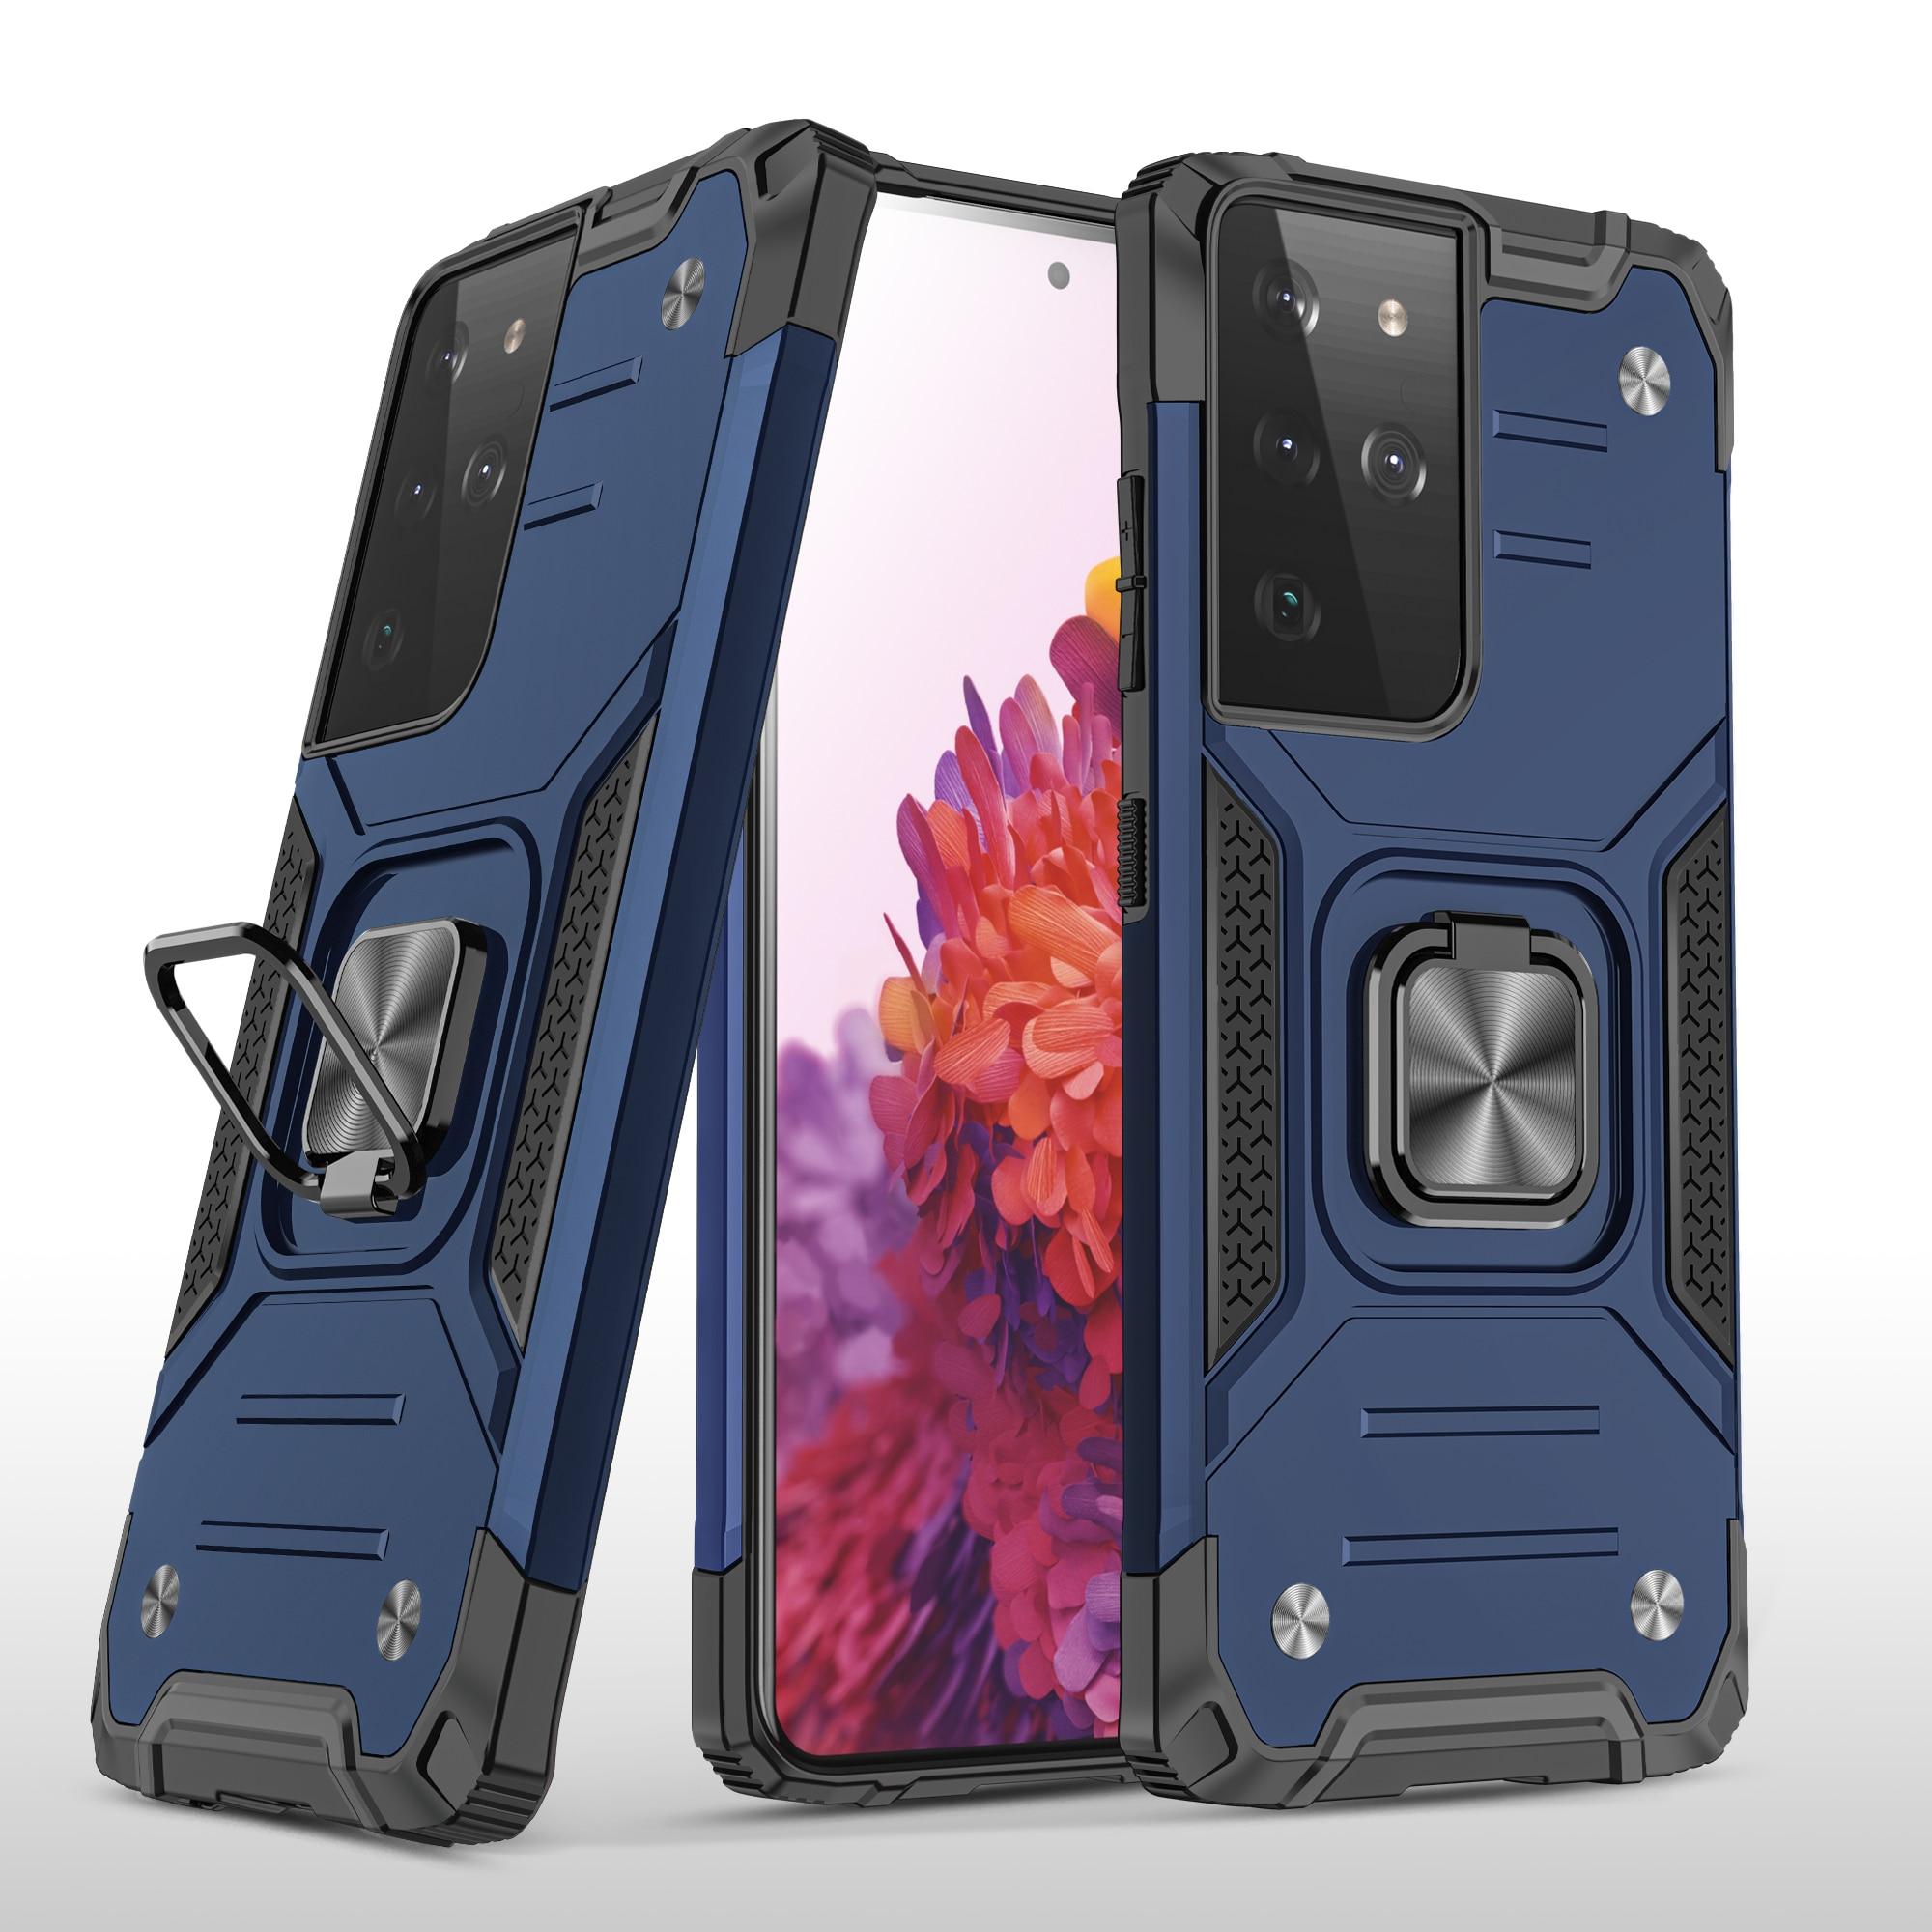 Galaxy S21 Ultra Kickstand Case 6